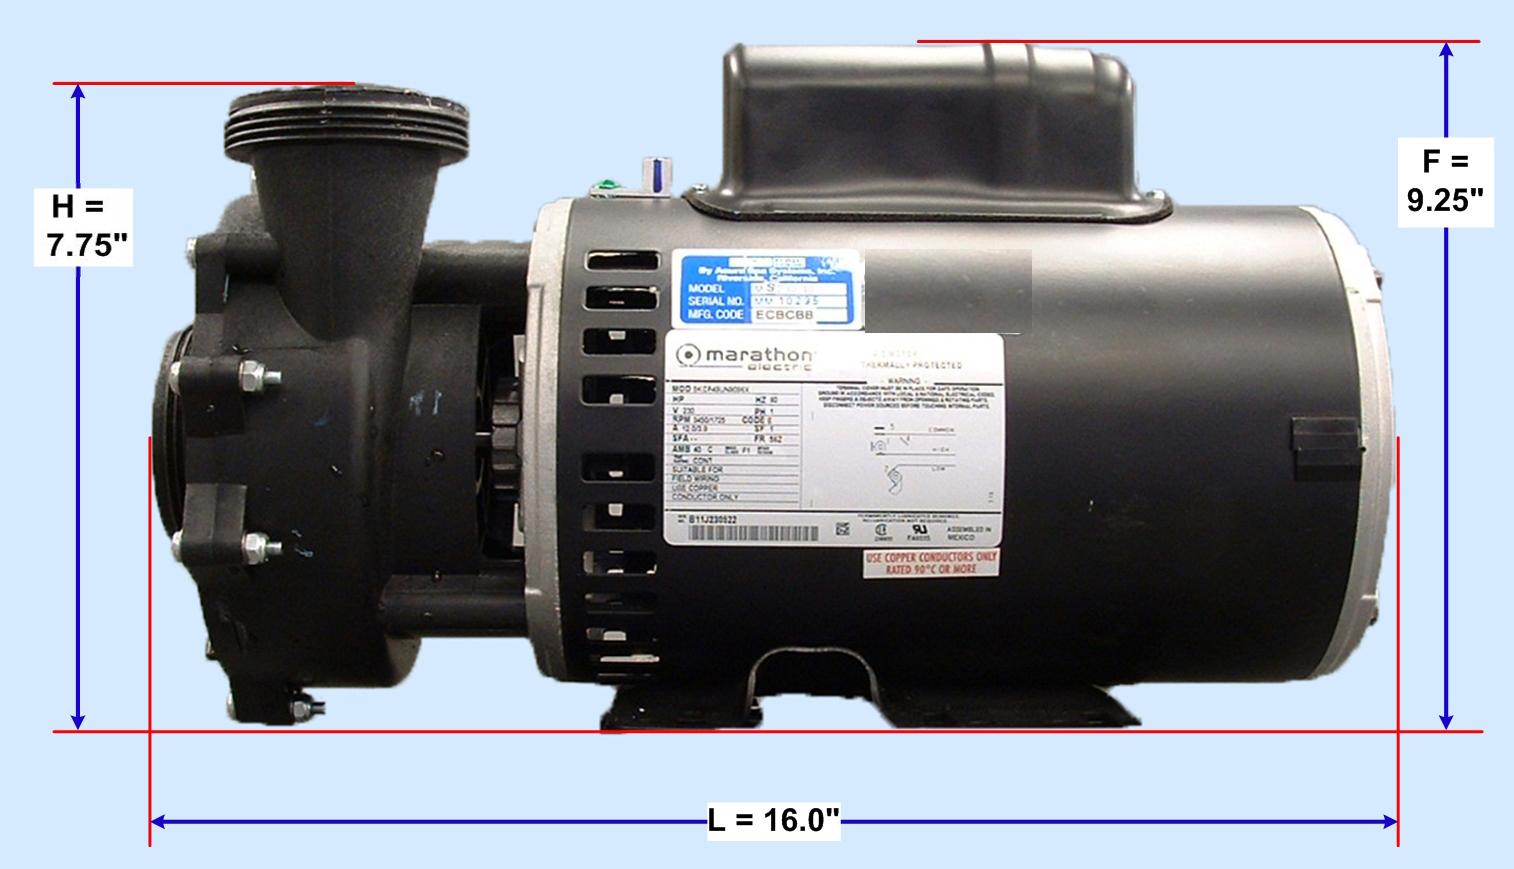 Wiring diagram for hayward super pump wiring diagram for for Pentair challenger pump motor